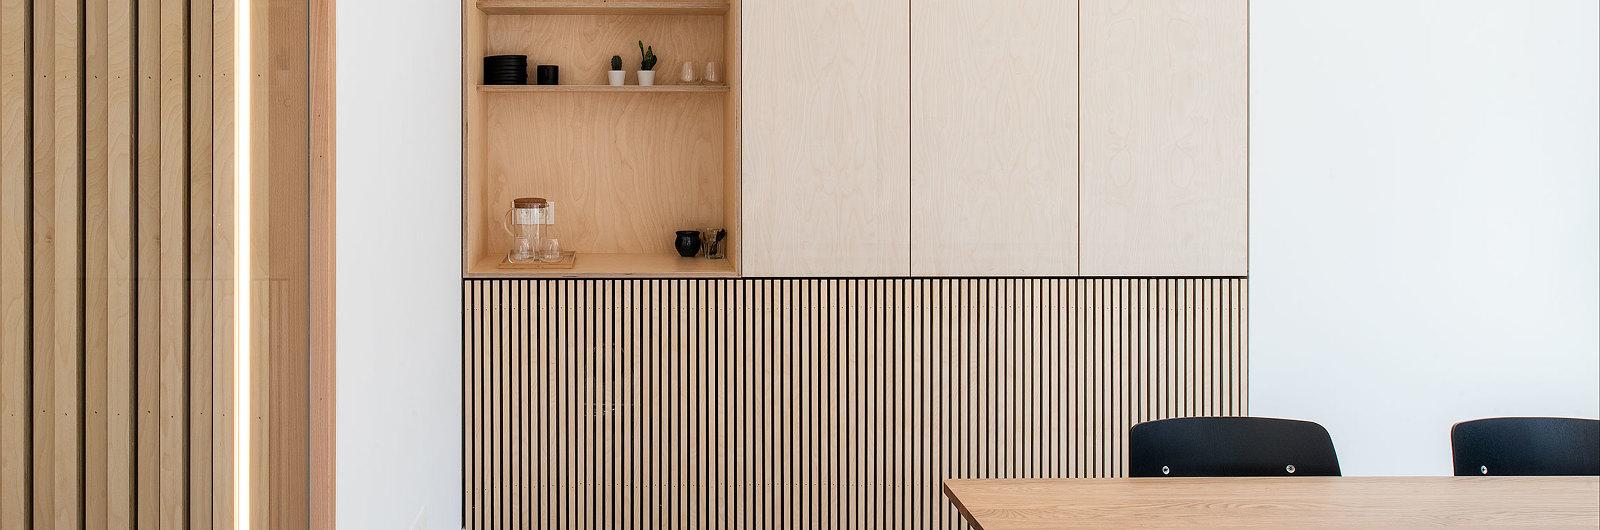 architectuur fotografie Patricia De Rycke Van Wassenhove Architecten